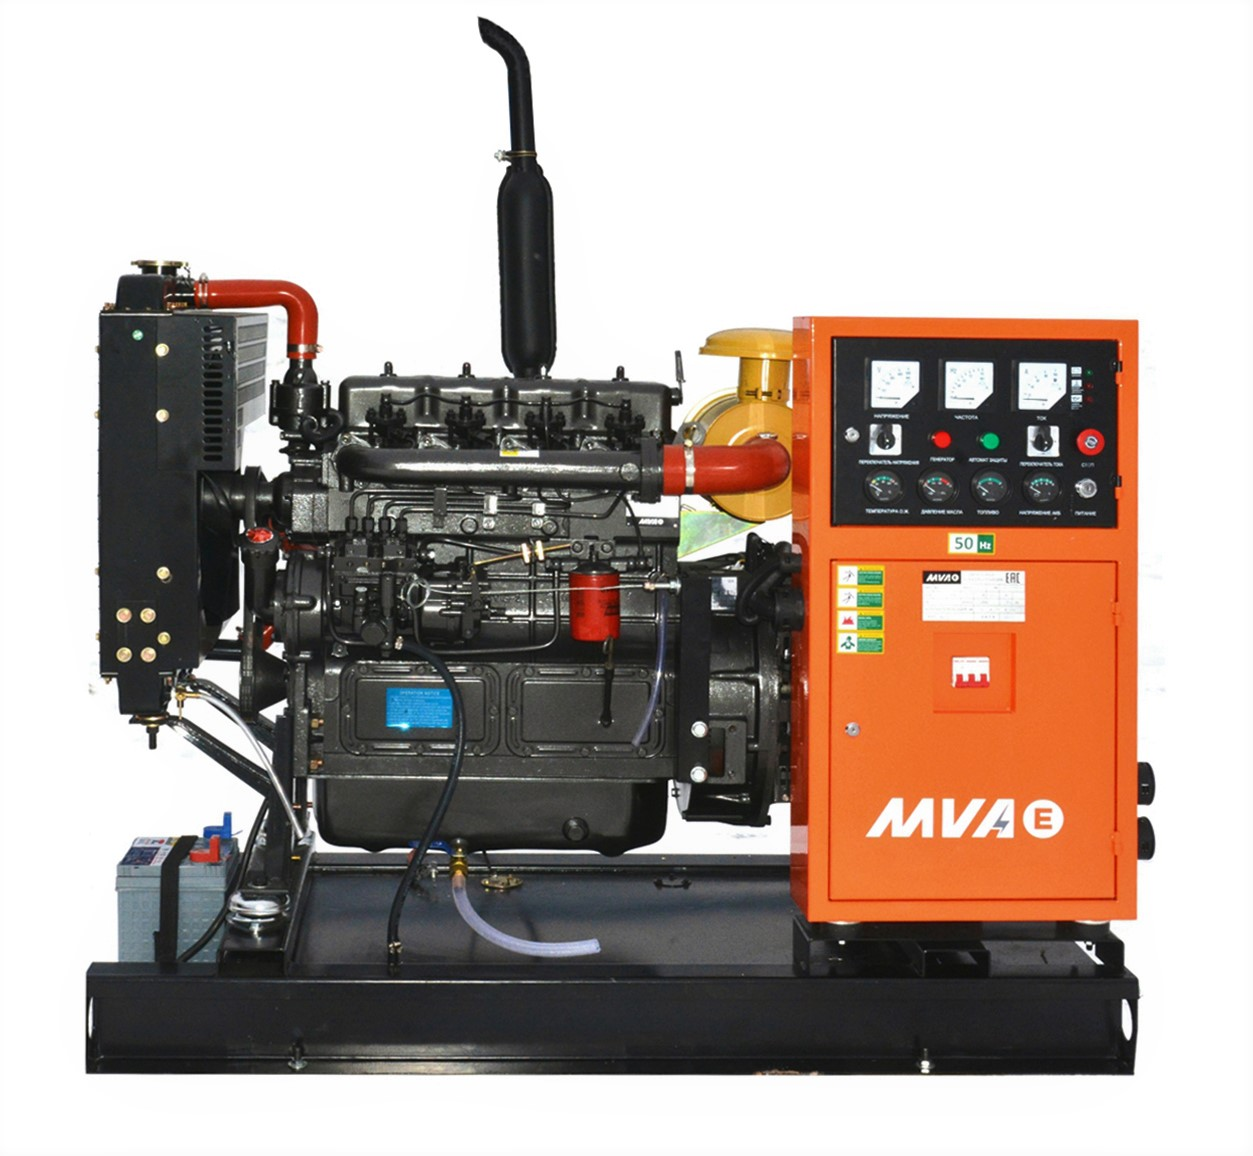 Дизель-генератор Mvae АД-16-230-Р